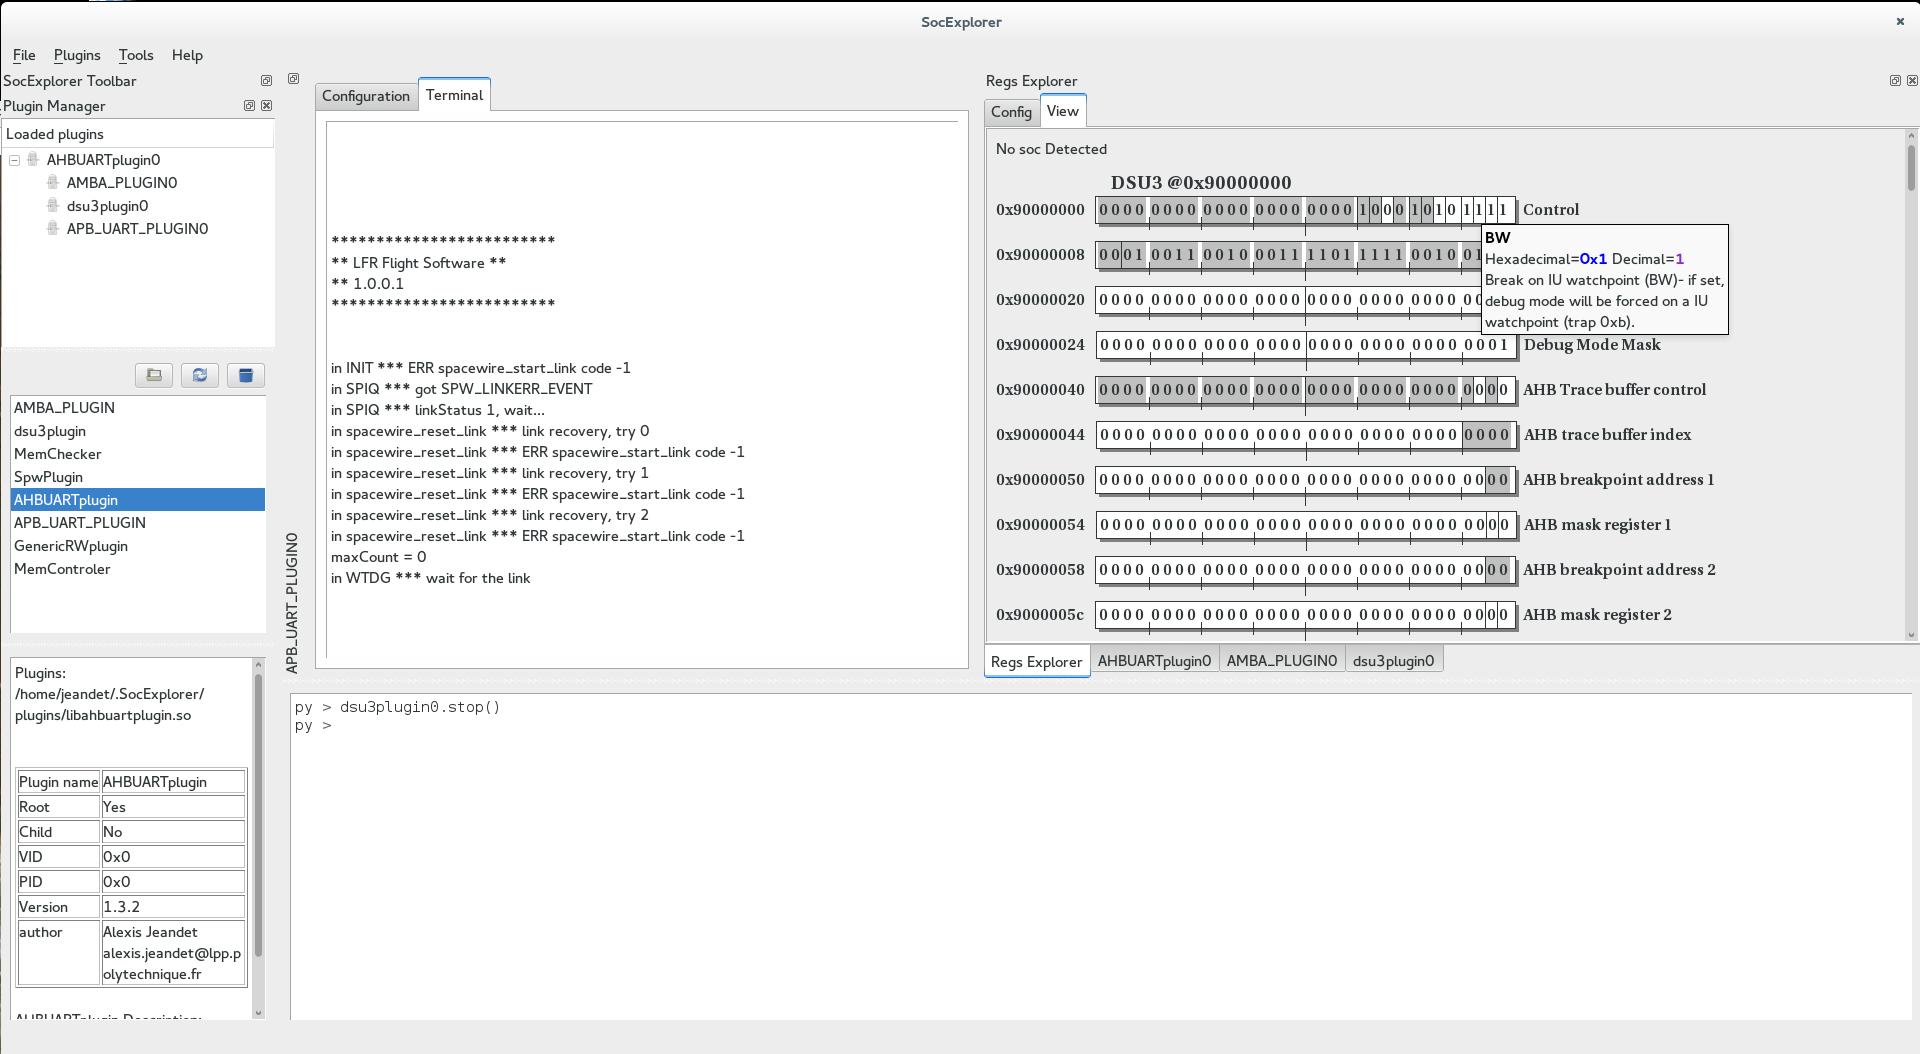 SocExplorer loading code on LFR